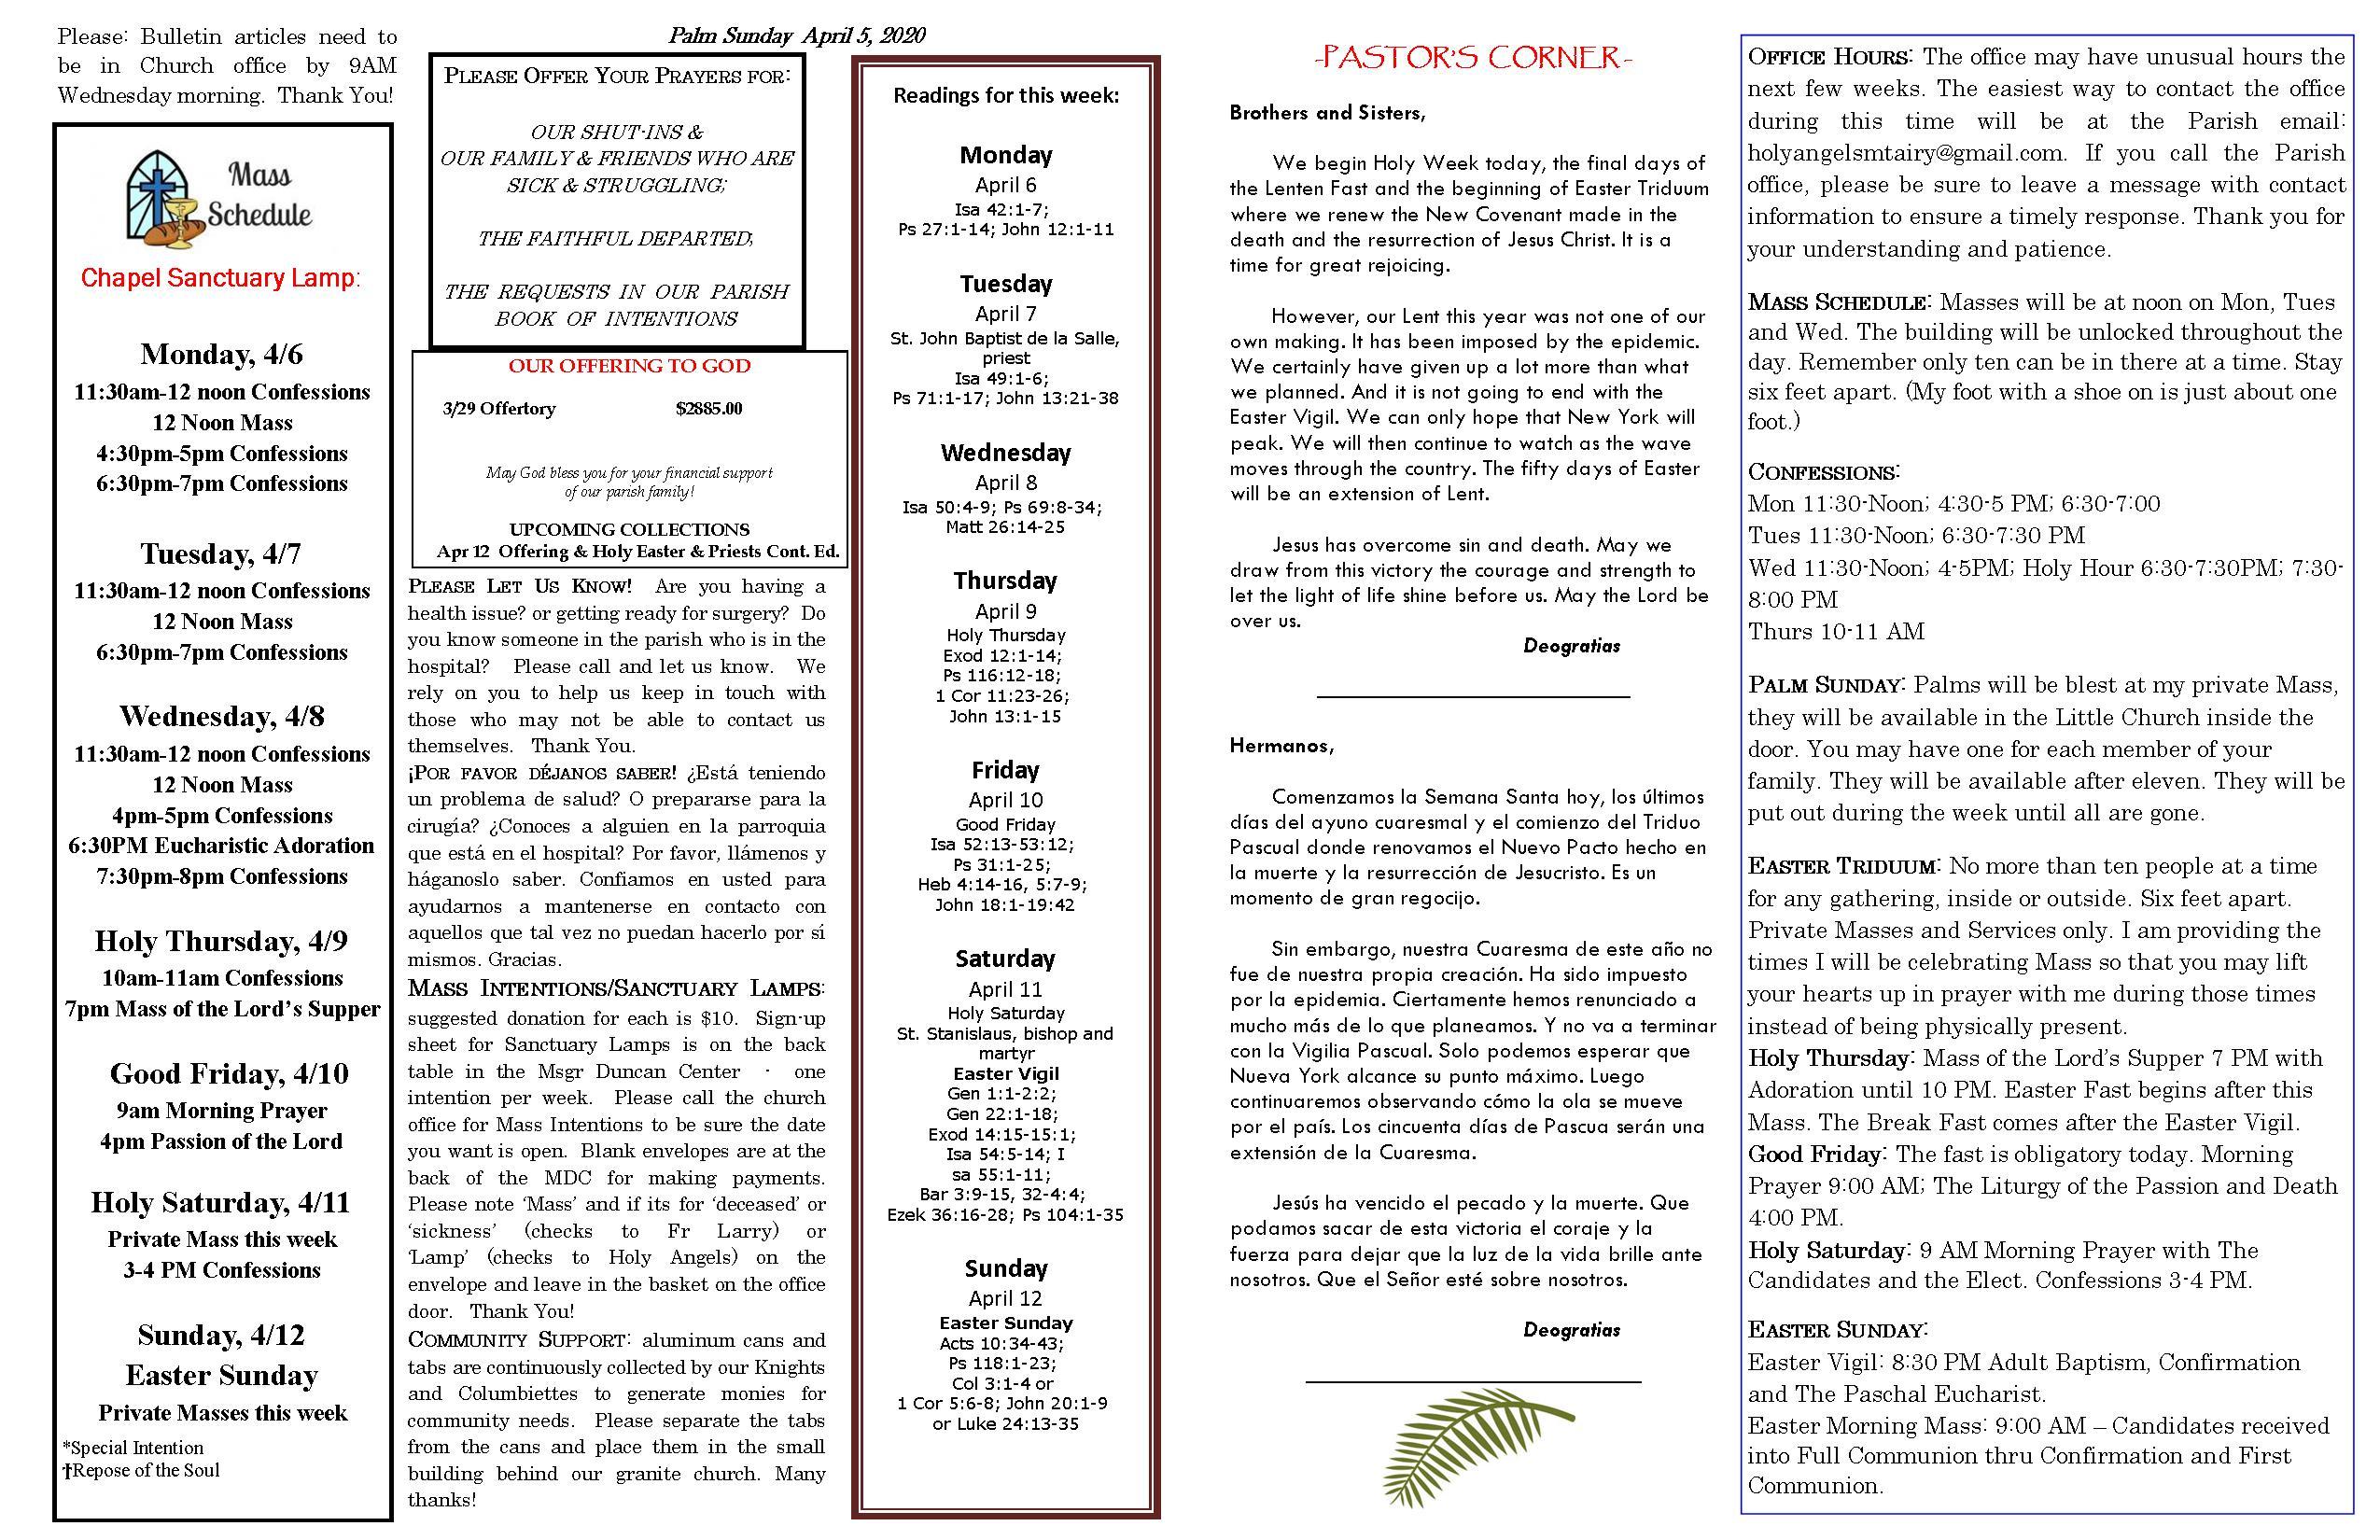 April 5 2020 page 2.jpg